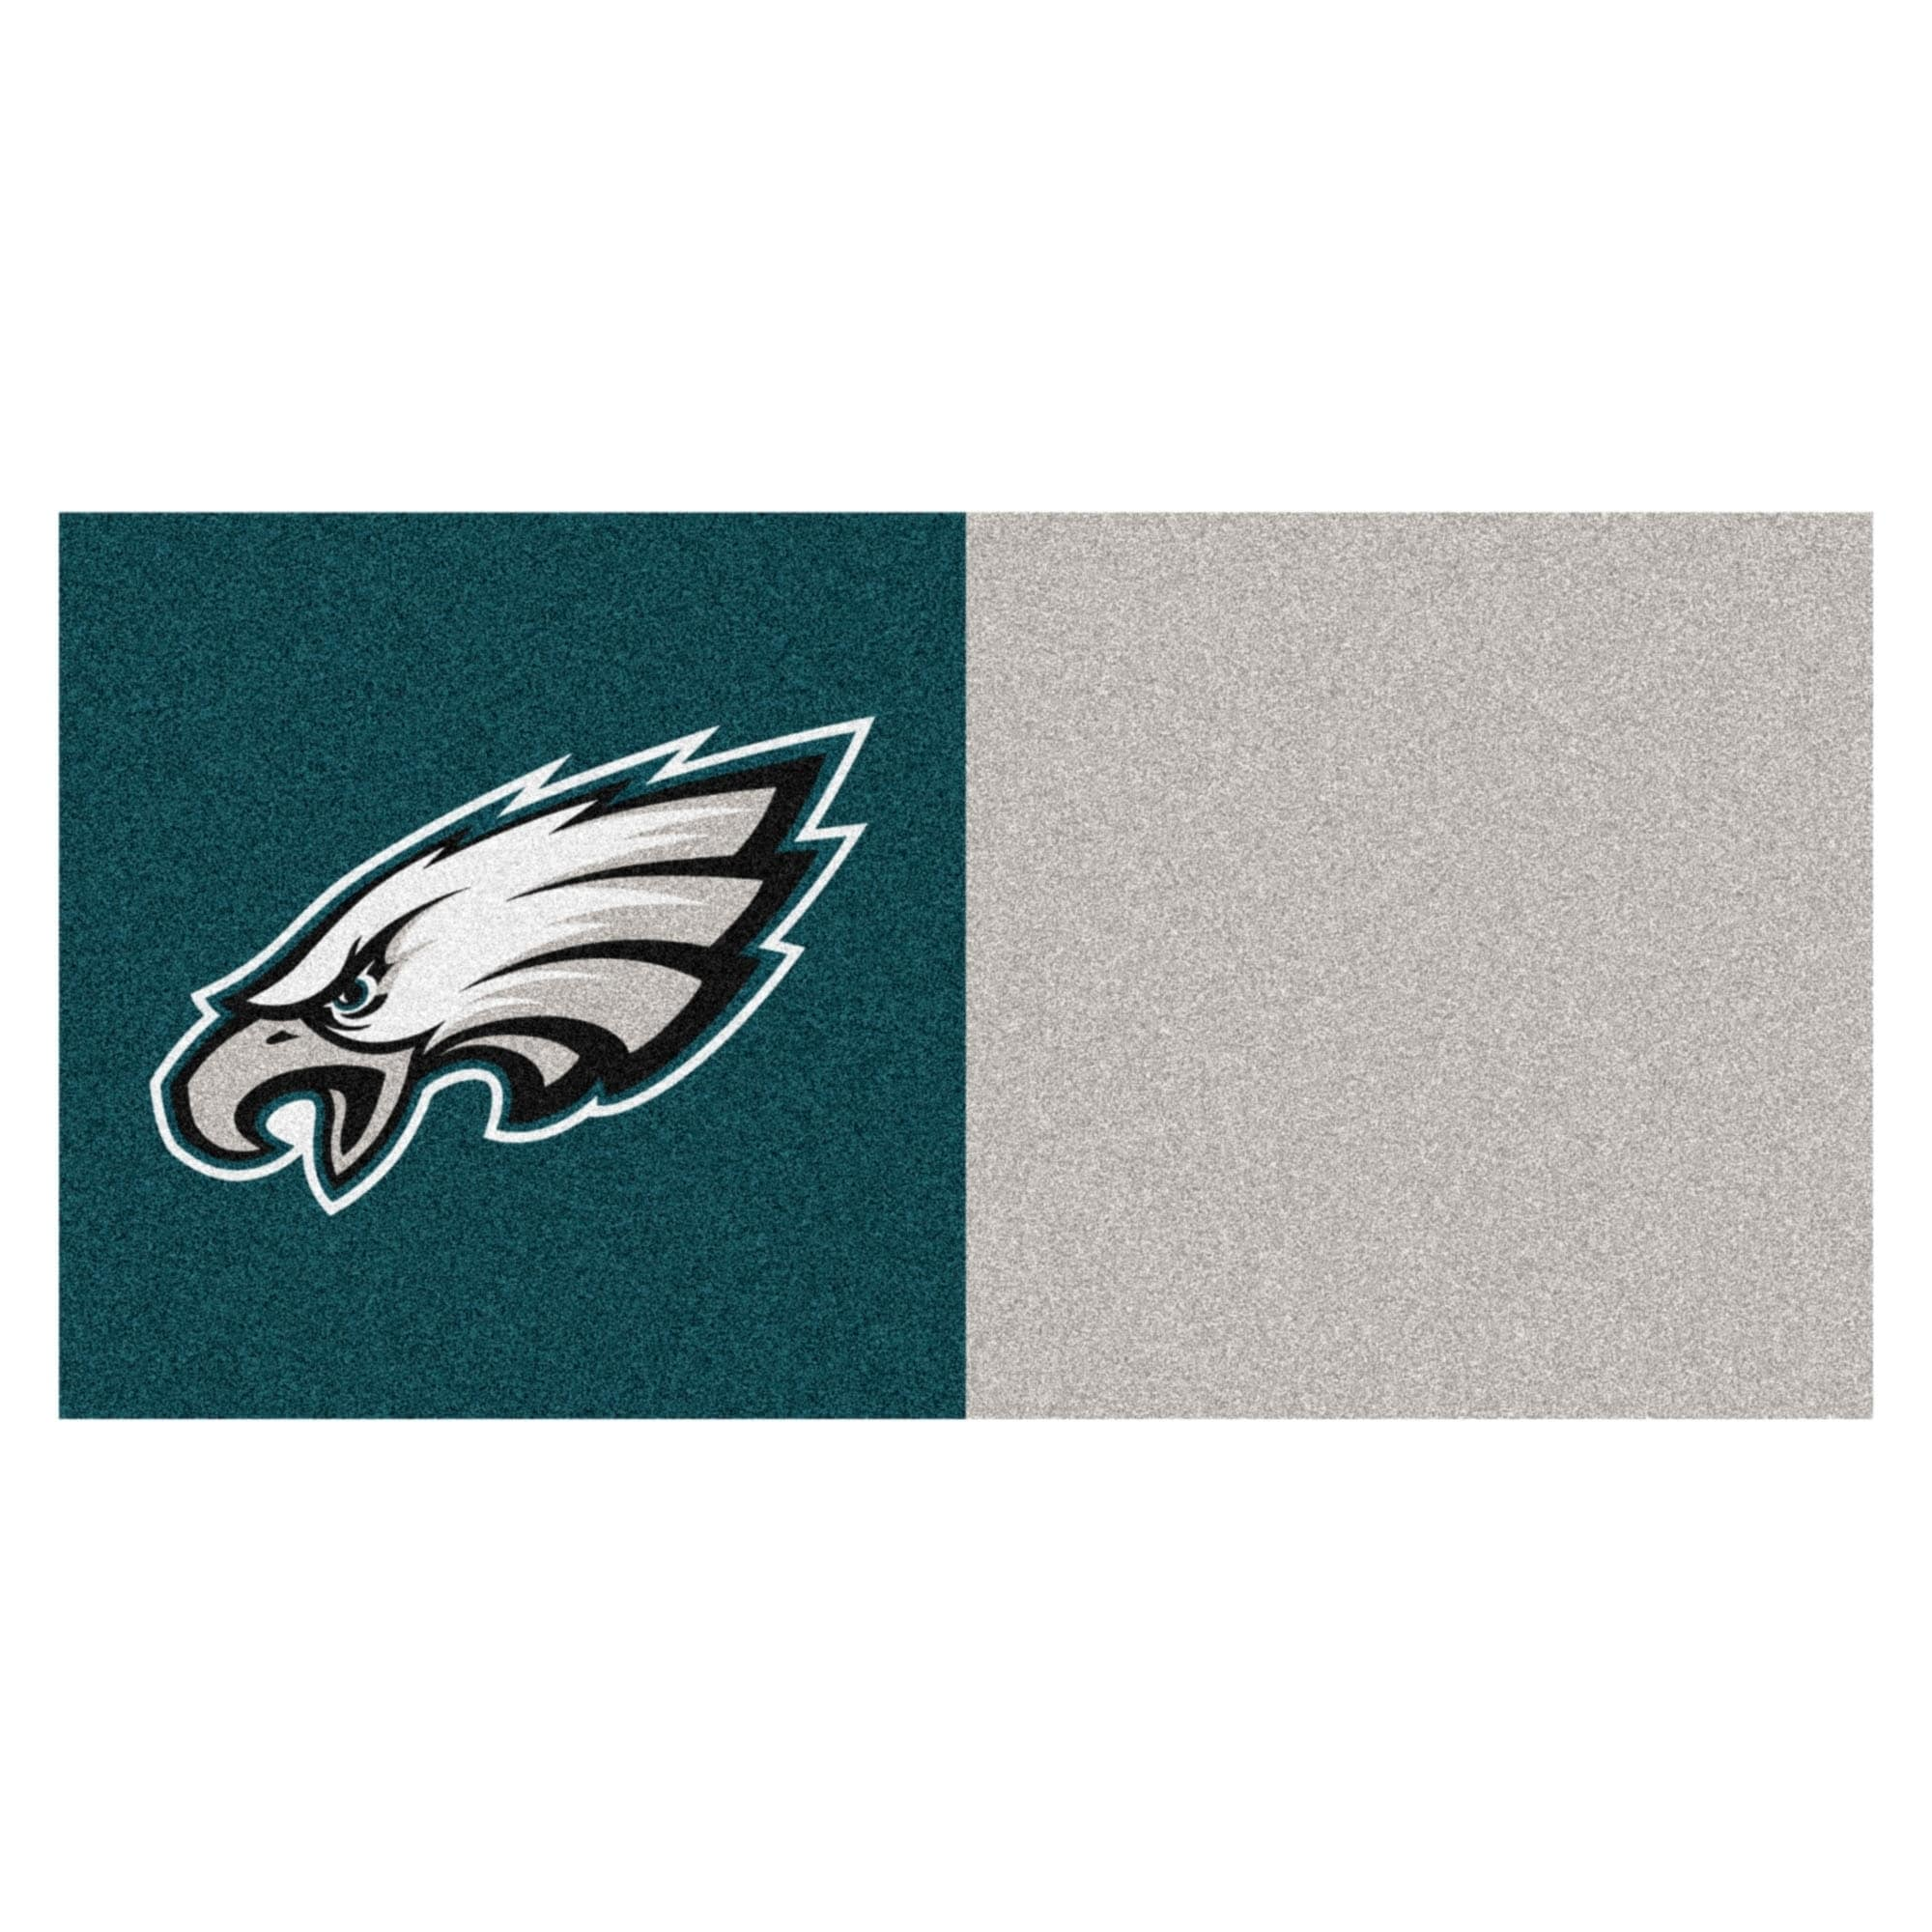 Fan Mats Philadelphia Eagles Teal and Grey Carpet Tiles (...